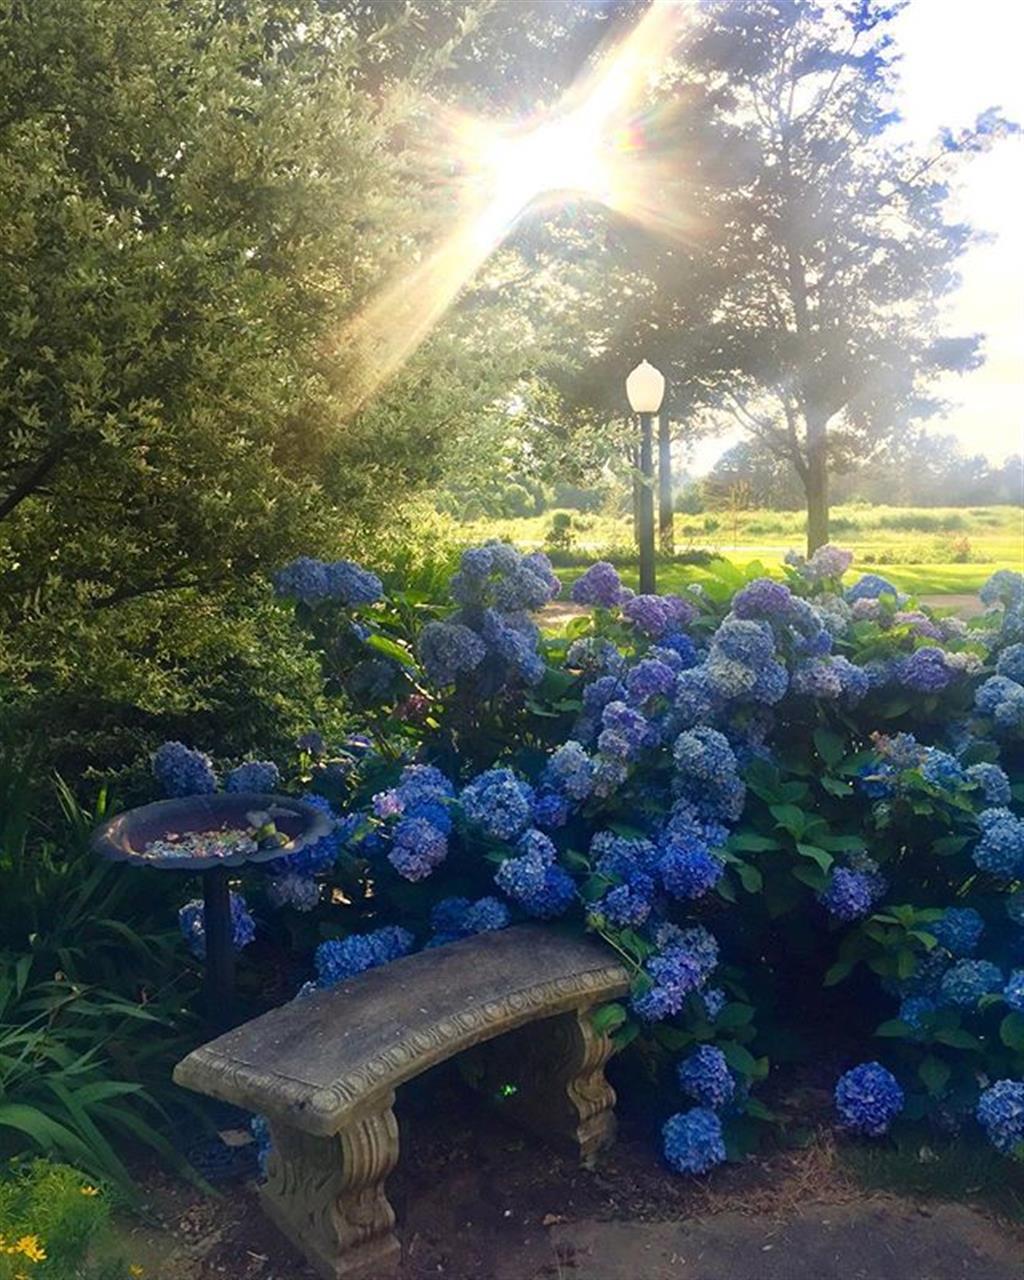 Hidden gems in #glenellyn #chicagosuburbs #flowers #parks #spring #leadingrelocal #chicago #westernsuburbs